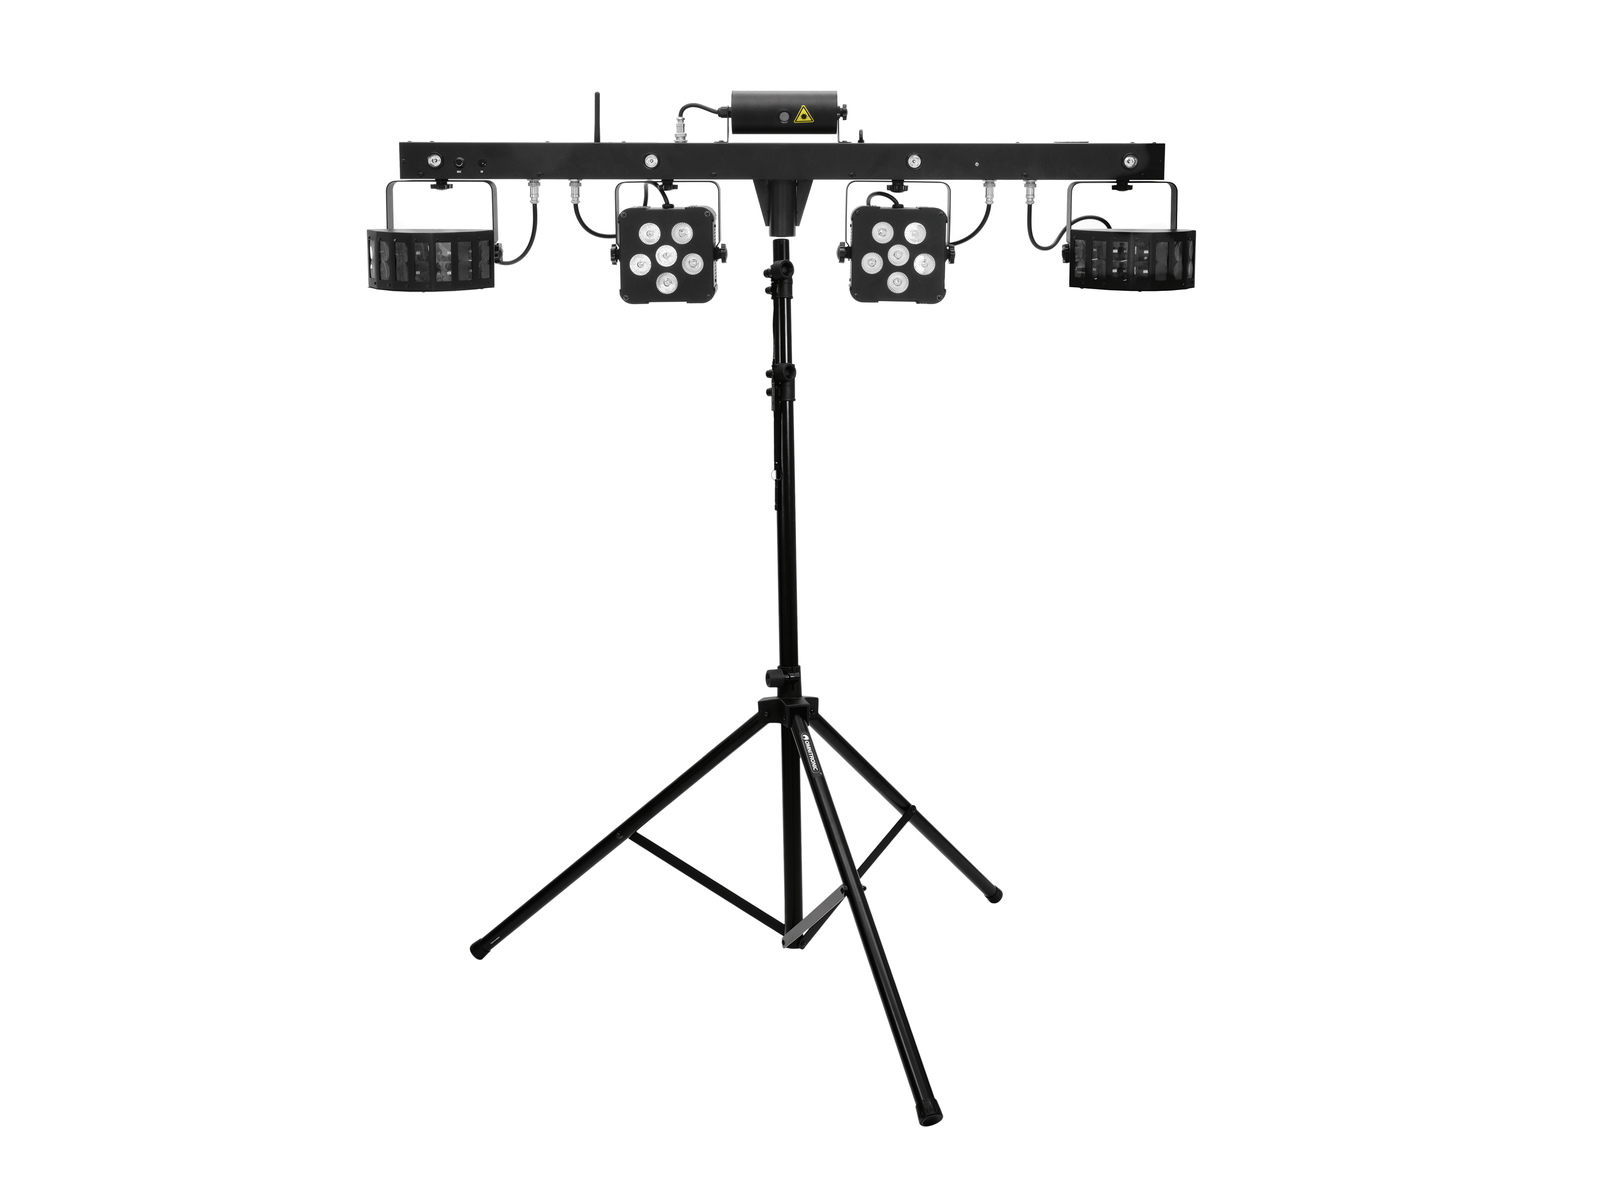 eurolite-set-led-kls-laser-bar-pro-fx-lichtset-m-4-boxenhochst